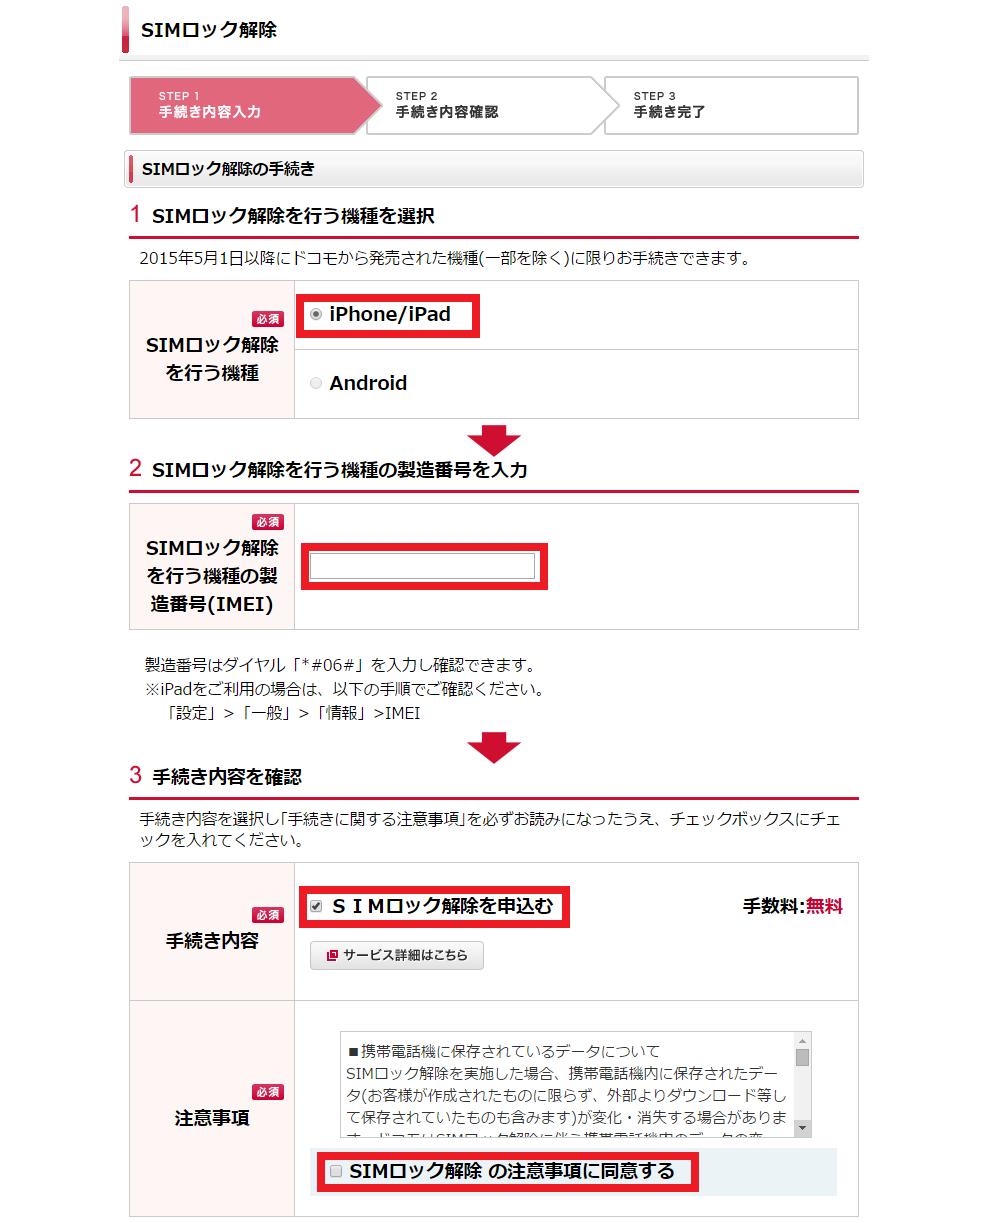 huhka.com 出張所: ドコモ版 iPhone 6sを購入当日にSIMロック解除した件